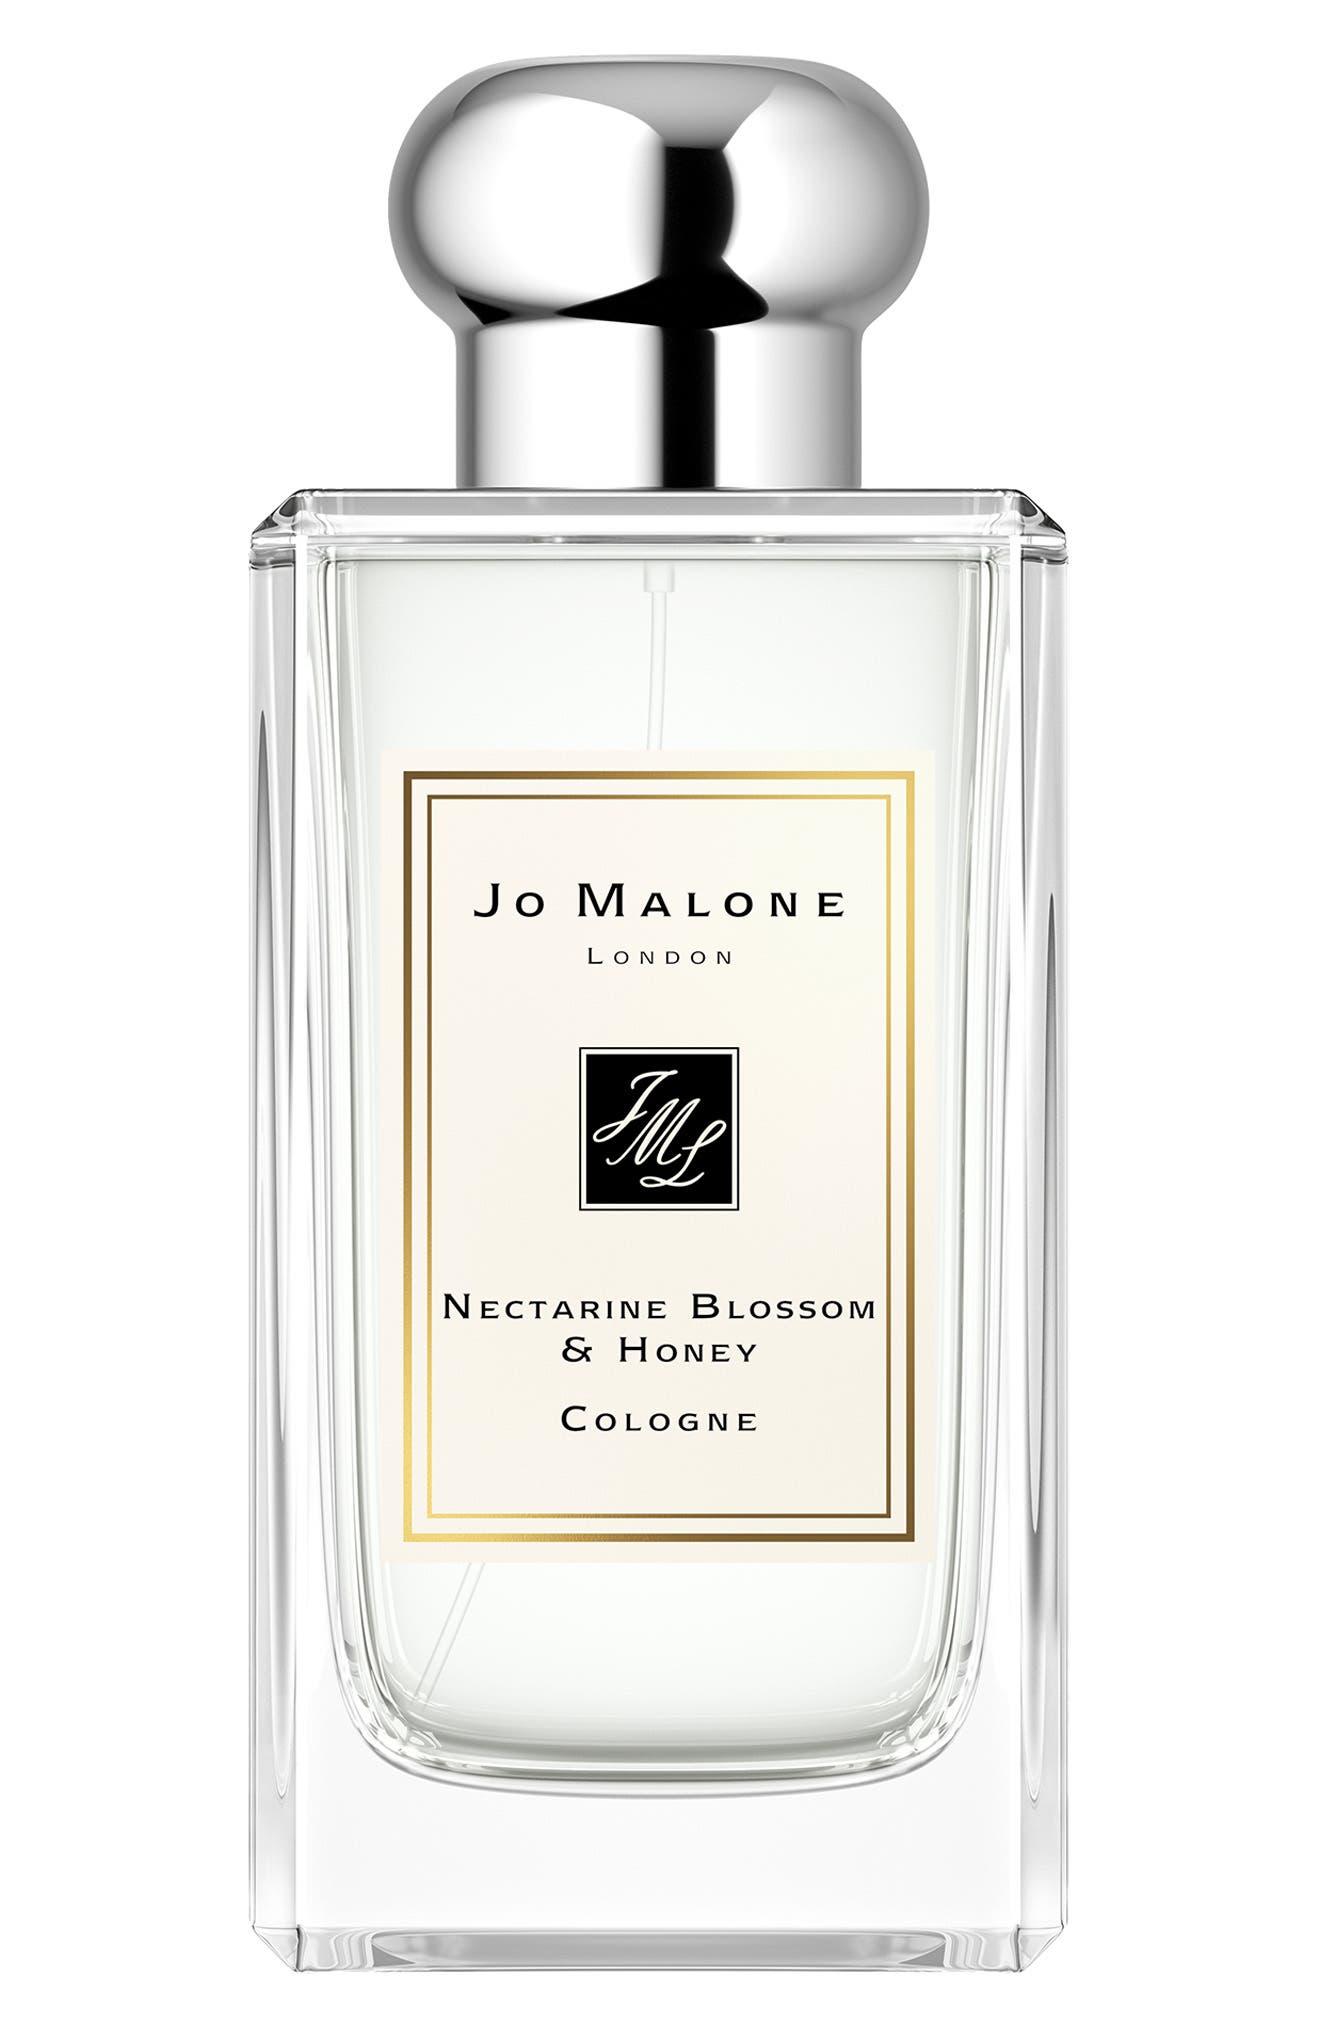 Jo Malone London(TM) Nectarine Blossom & Honey Cologne